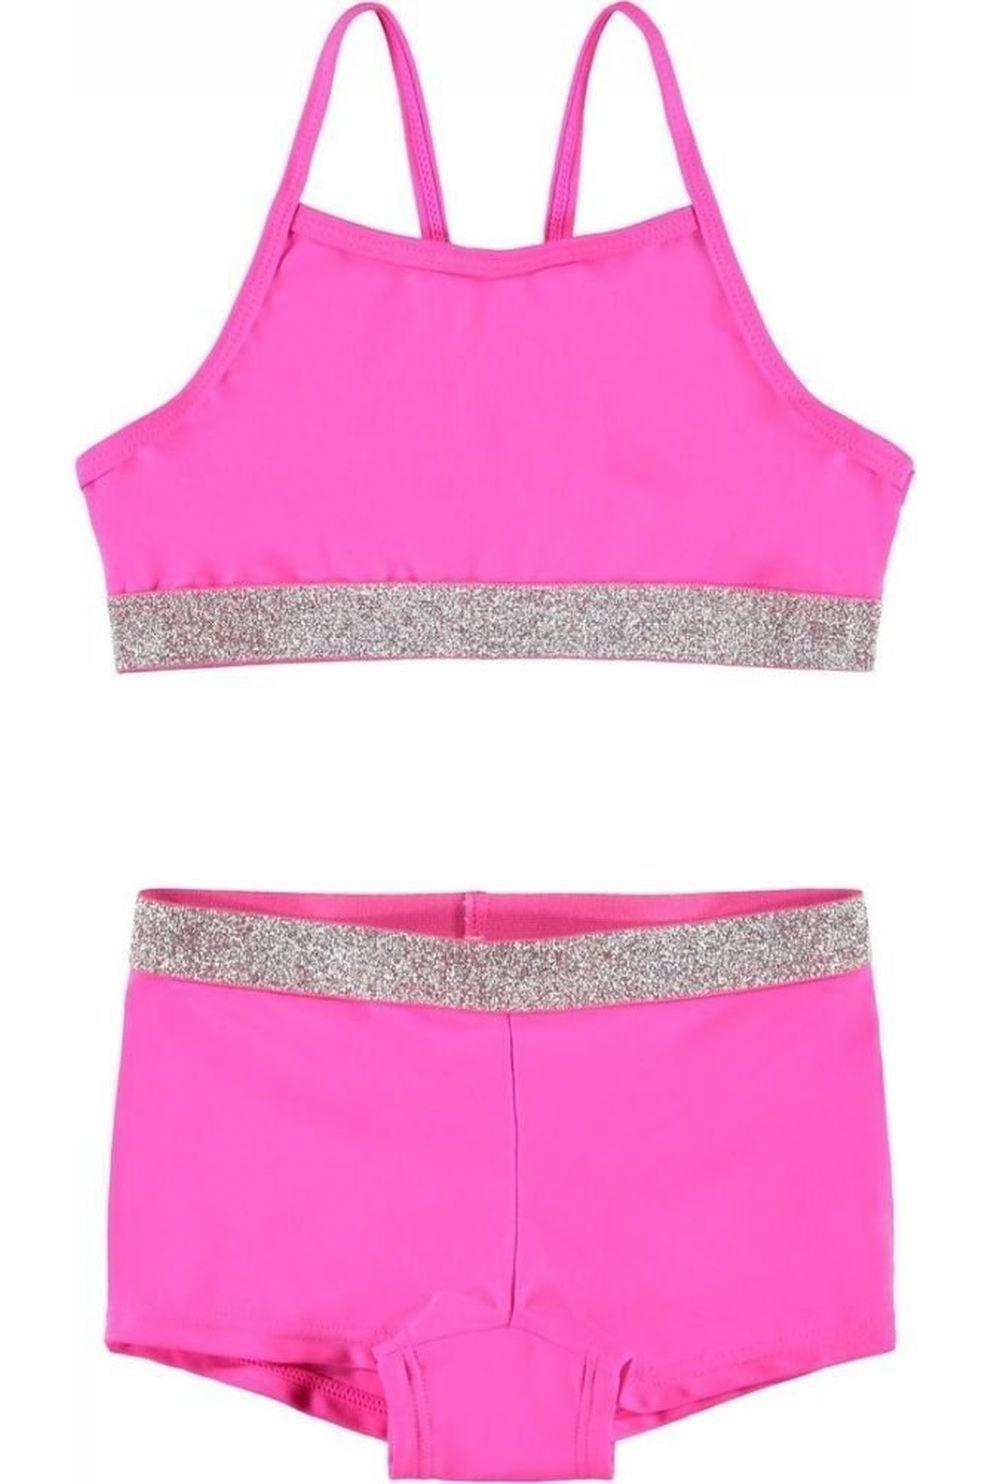 NAME IT Bikini Zilka voor meisjes - Roze - Maten: 116, 128, 140, 152, 164